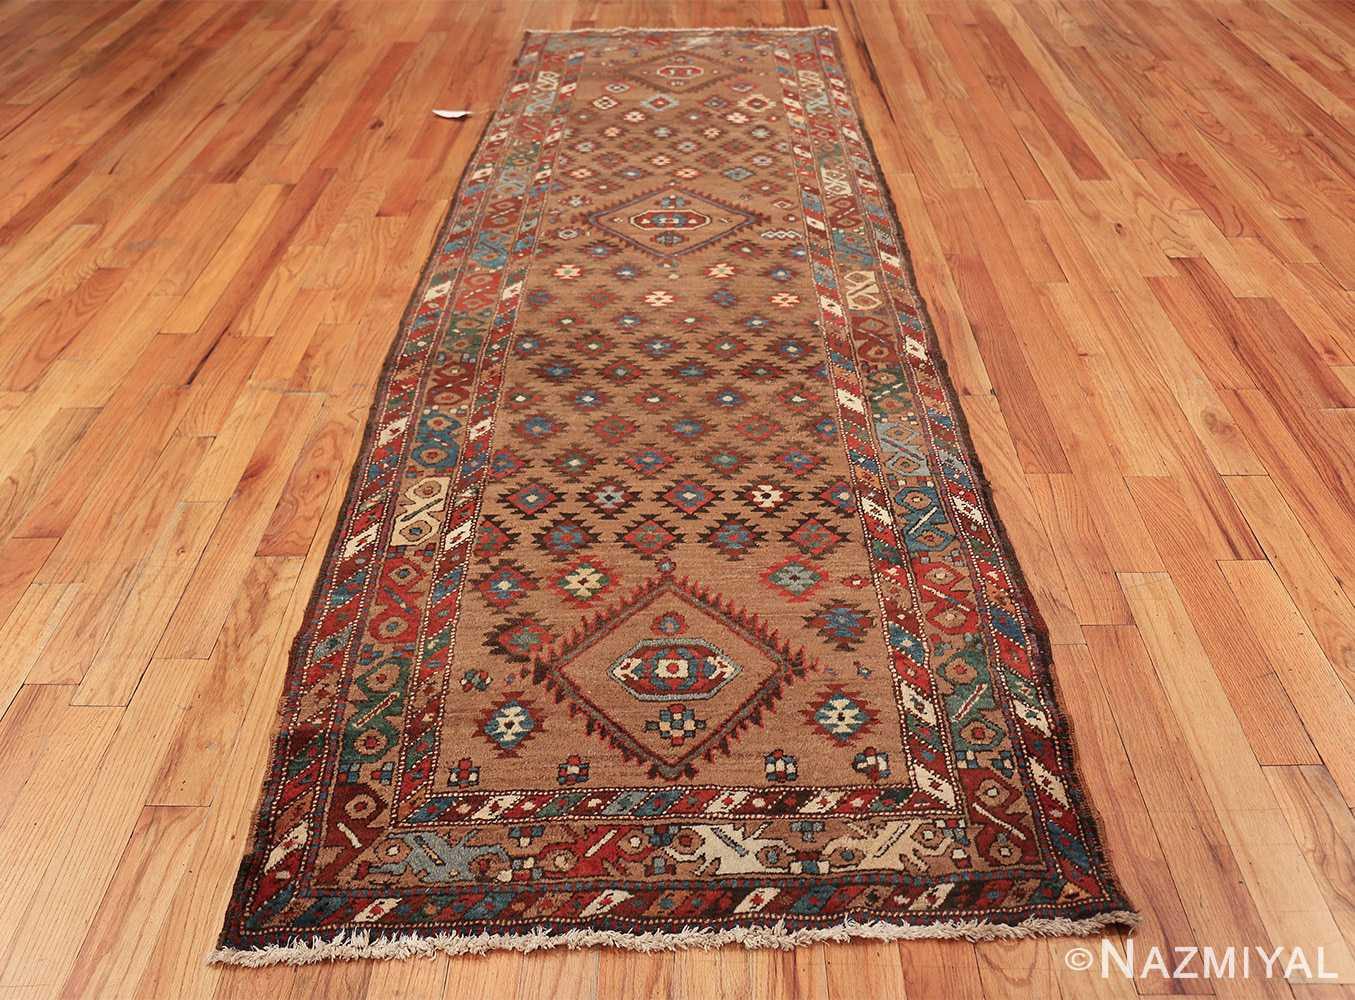 tribal antique persian bakshaish runner rug 49712 whole Nazmiyal